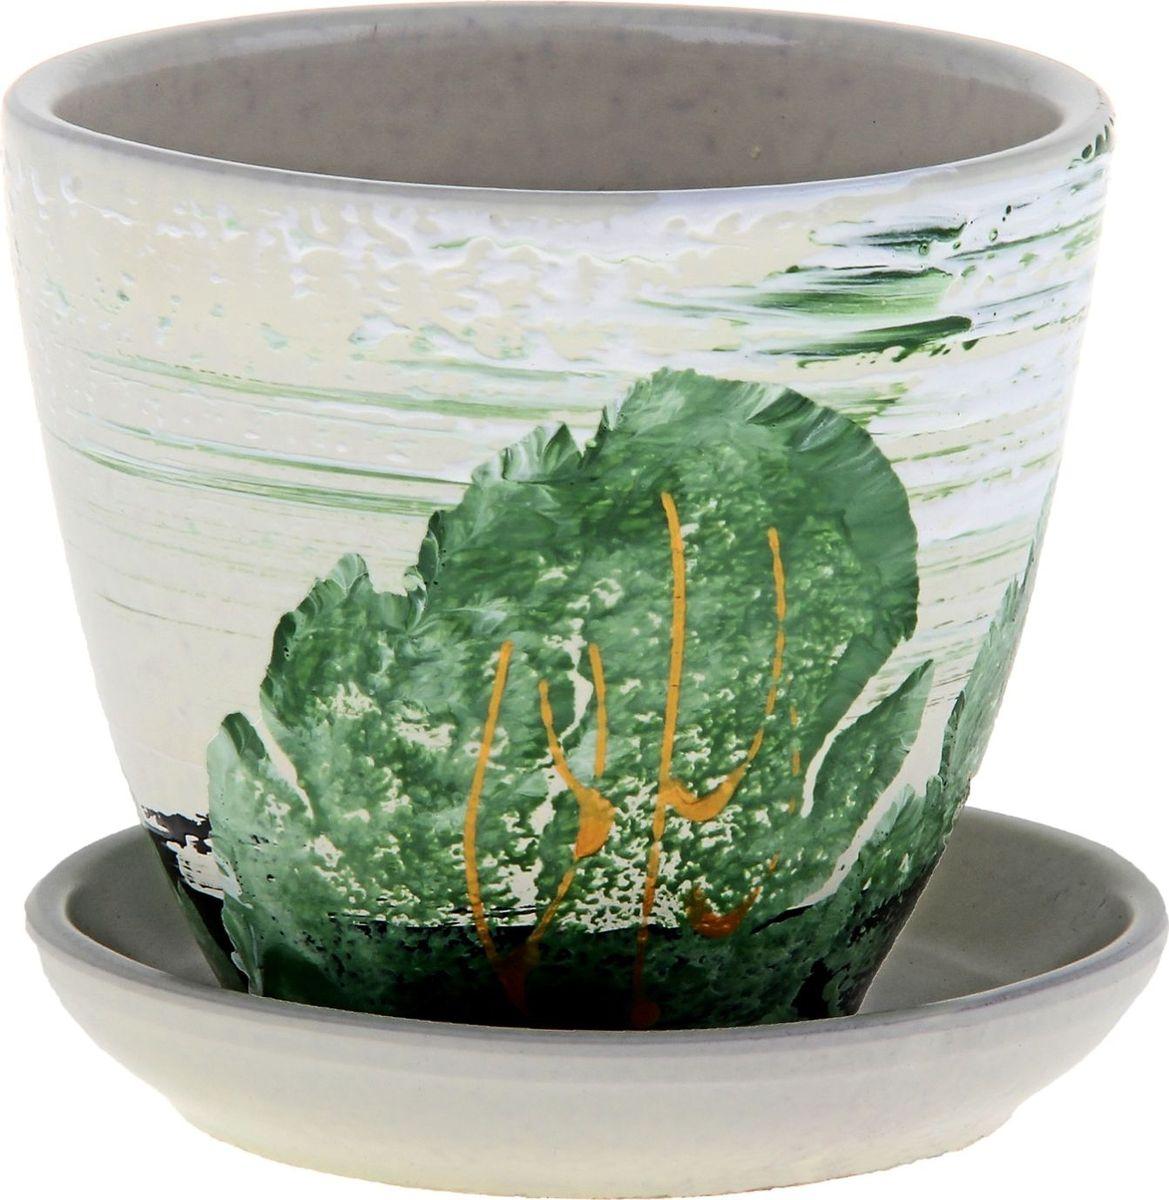 Кашпо Клен, цвет: зеленый, 0,4 л164926